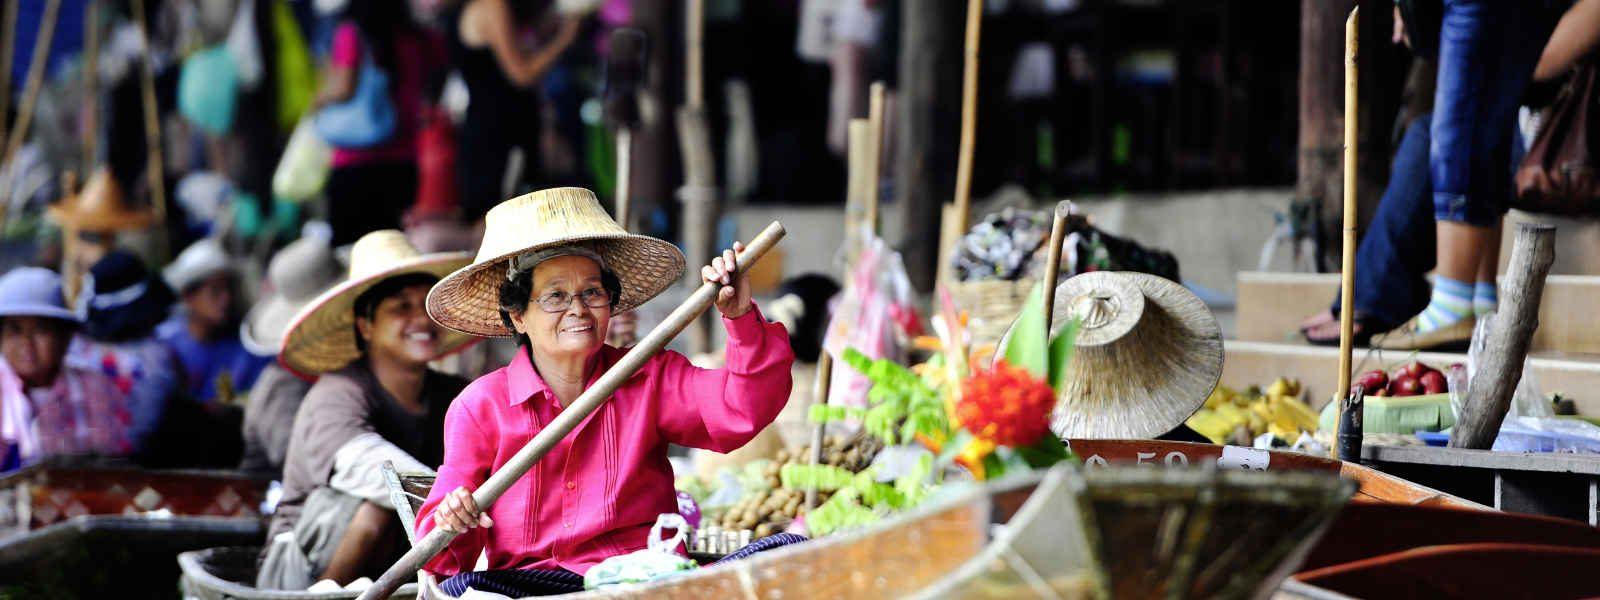 Marché flottant de Damnoen Saduak,Bangkok, Thaïlande